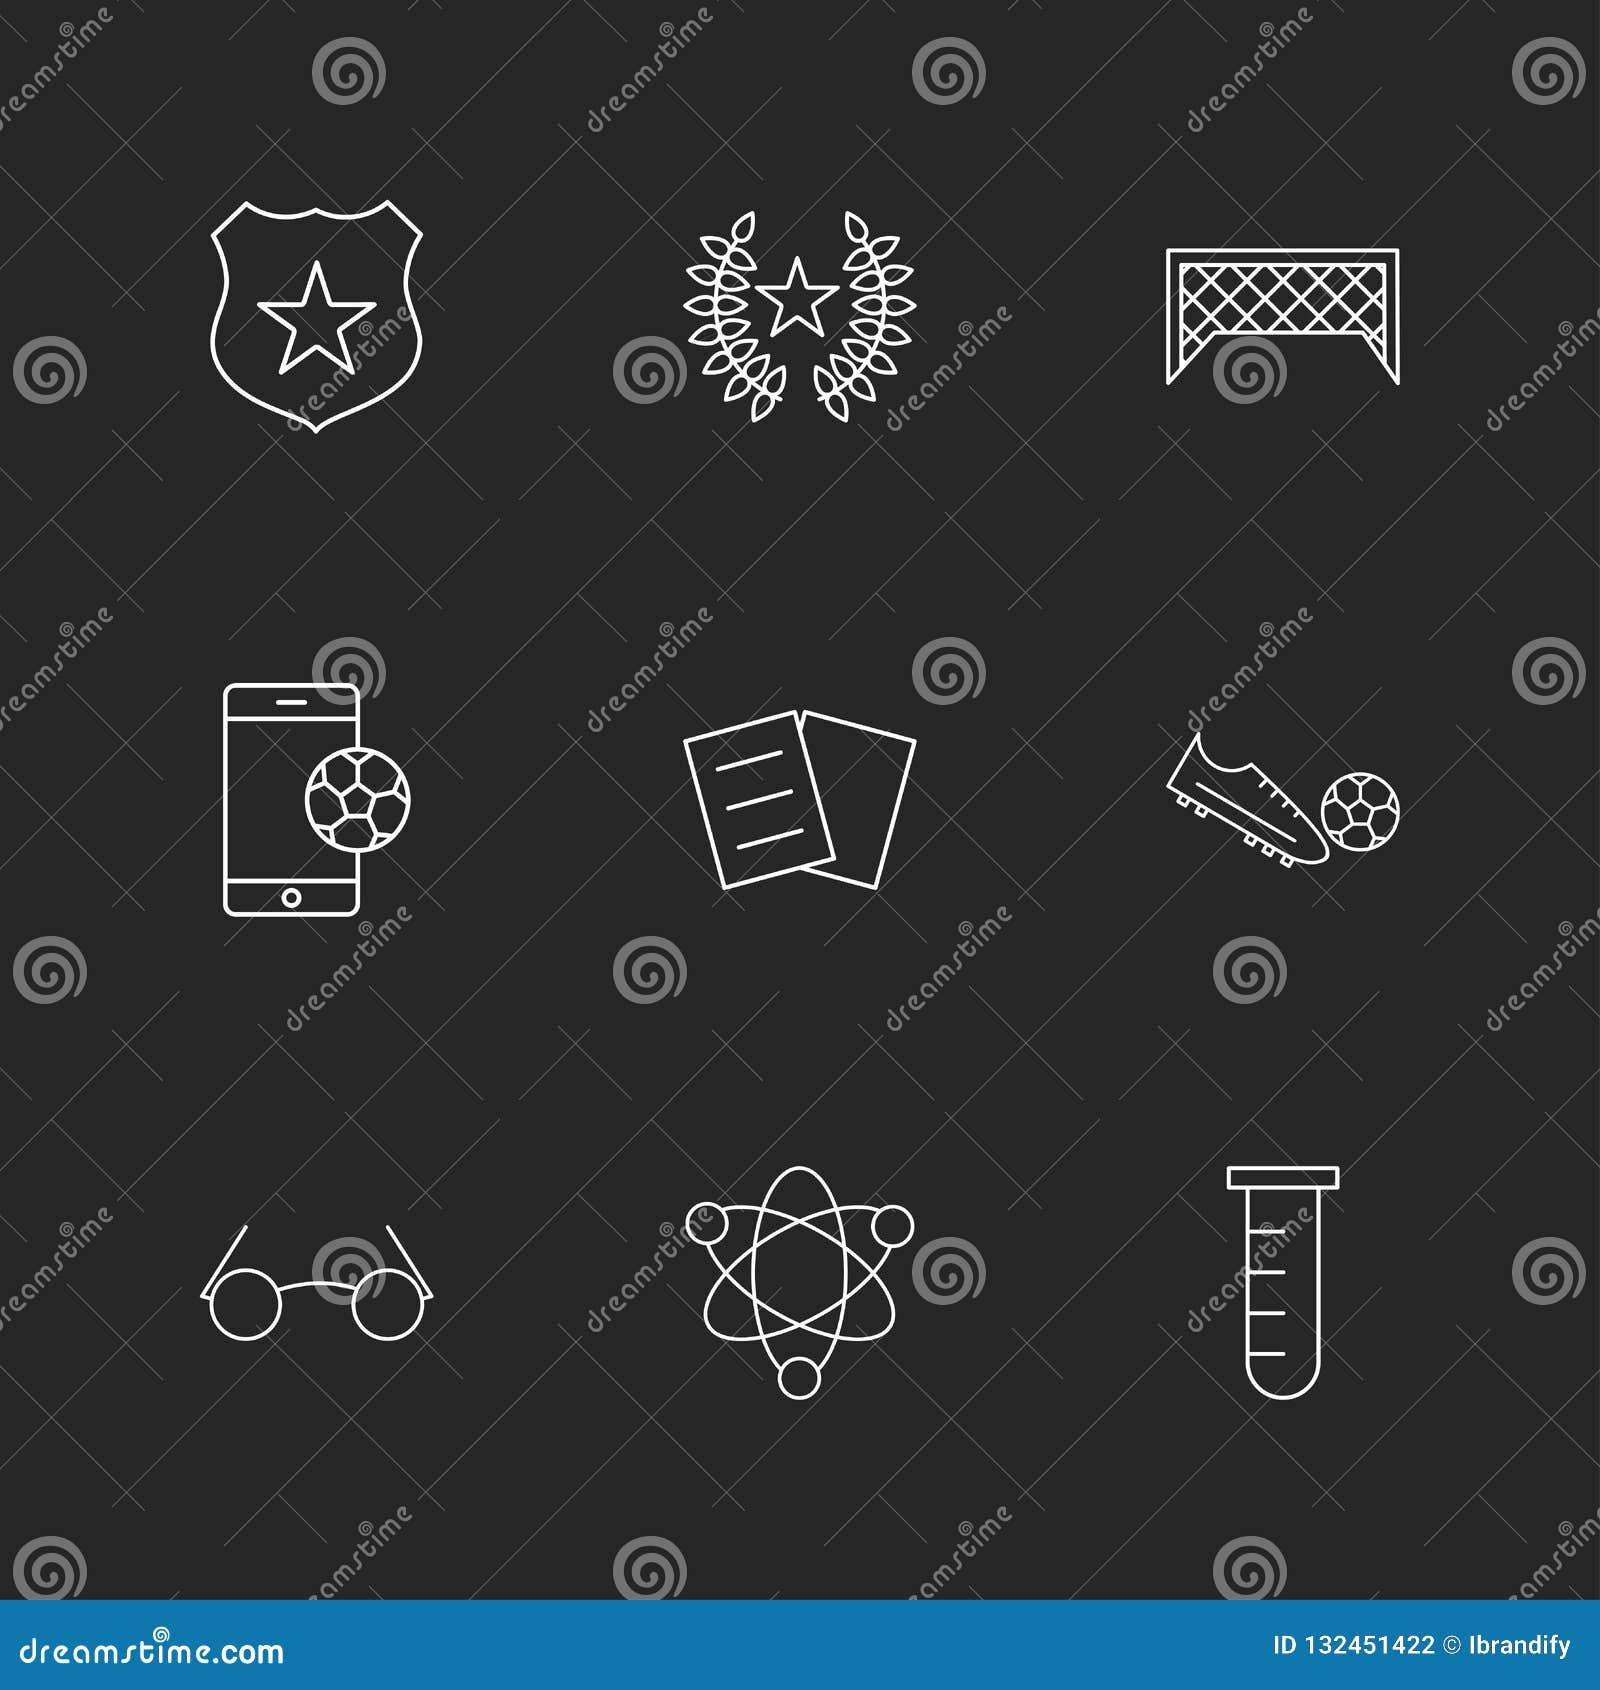 Sheild,橄榄球,目标,机动性,反撞力,化学制品,核, e